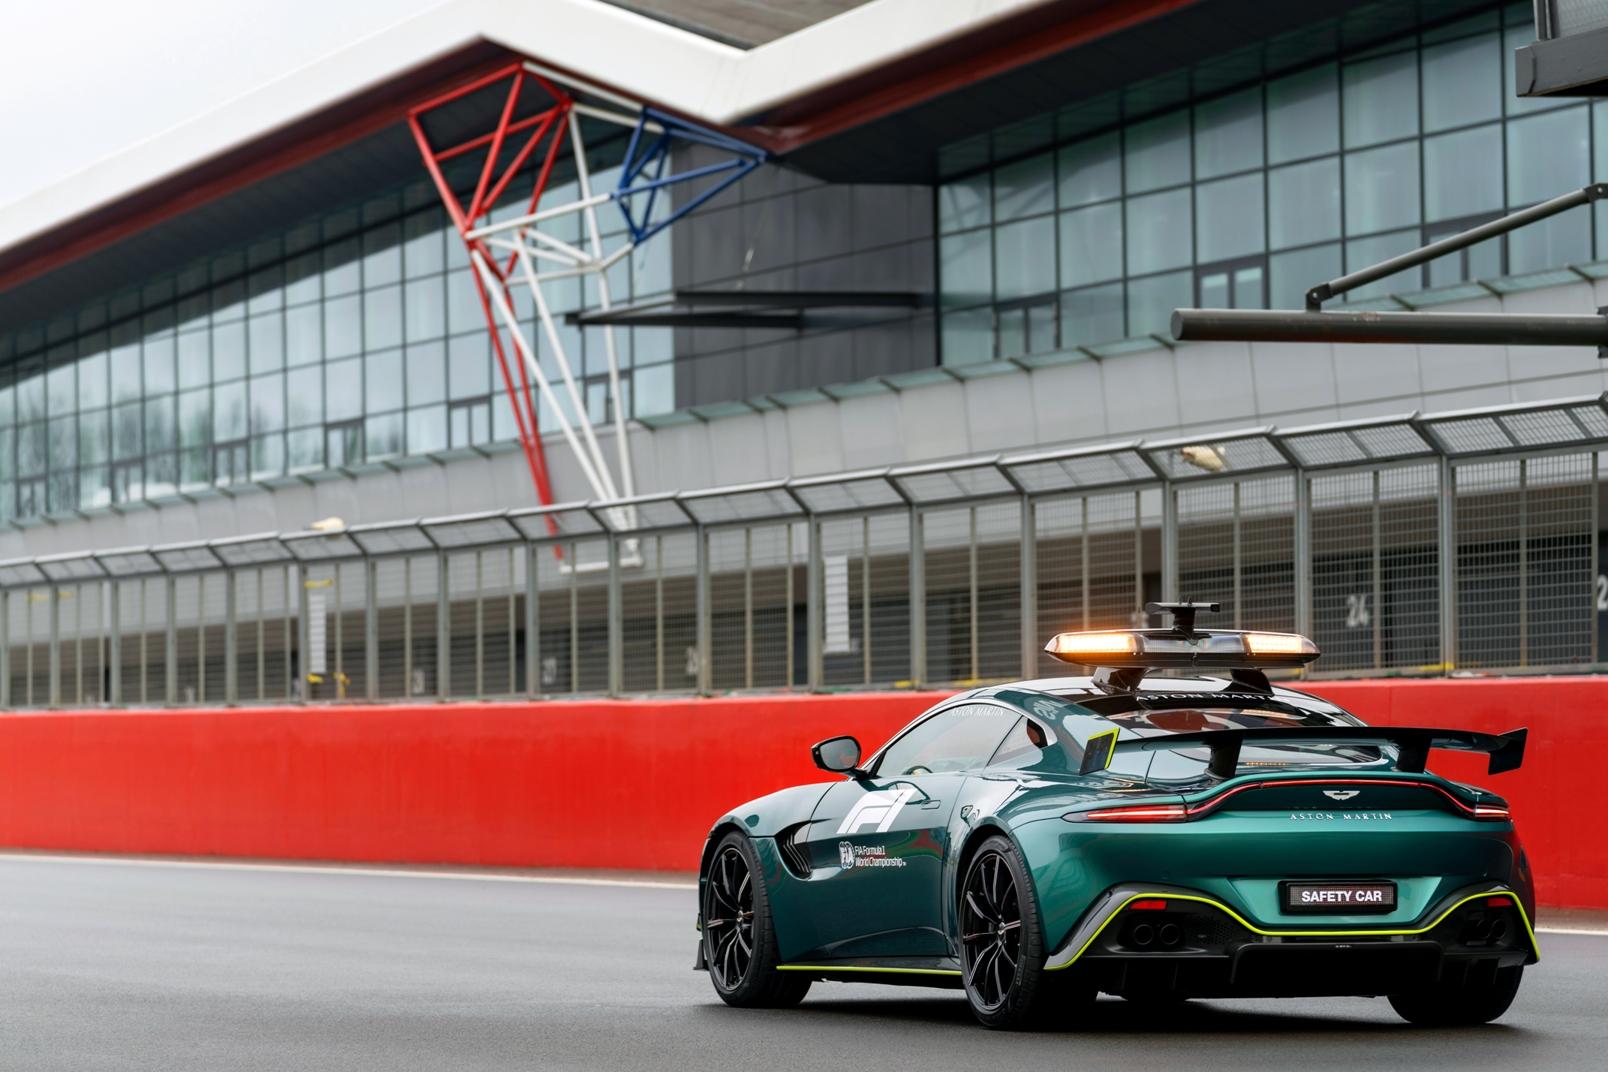 Aston Martin Vantage Official Safety Car Formula One (10)